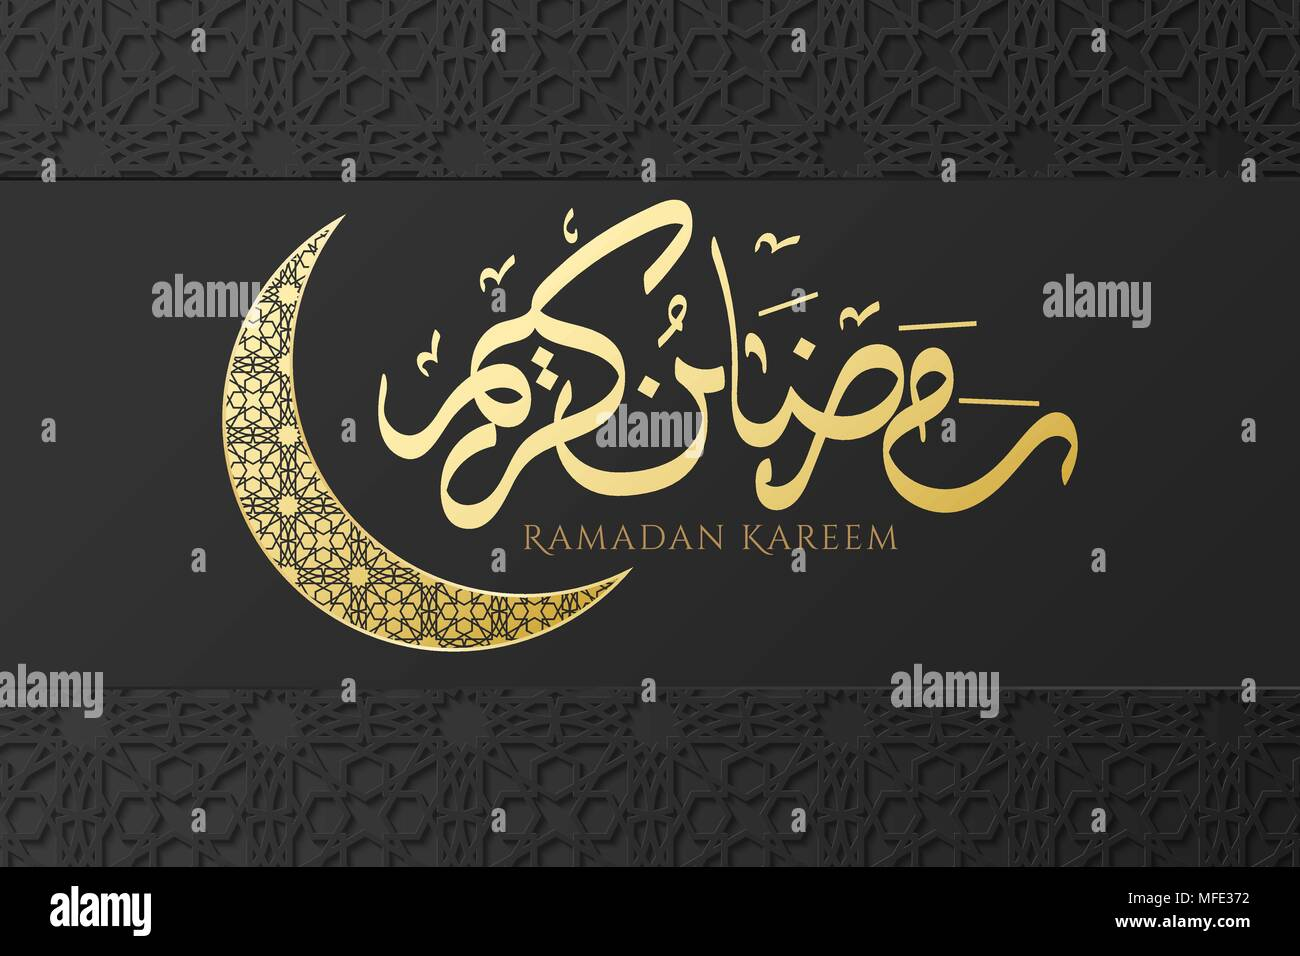 Eid mubarak gift stock photos eid mubarak gift stock images alamy gift horizontal card on ramadan kareem gold moon islamic dark geometric ornament hand m4hsunfo